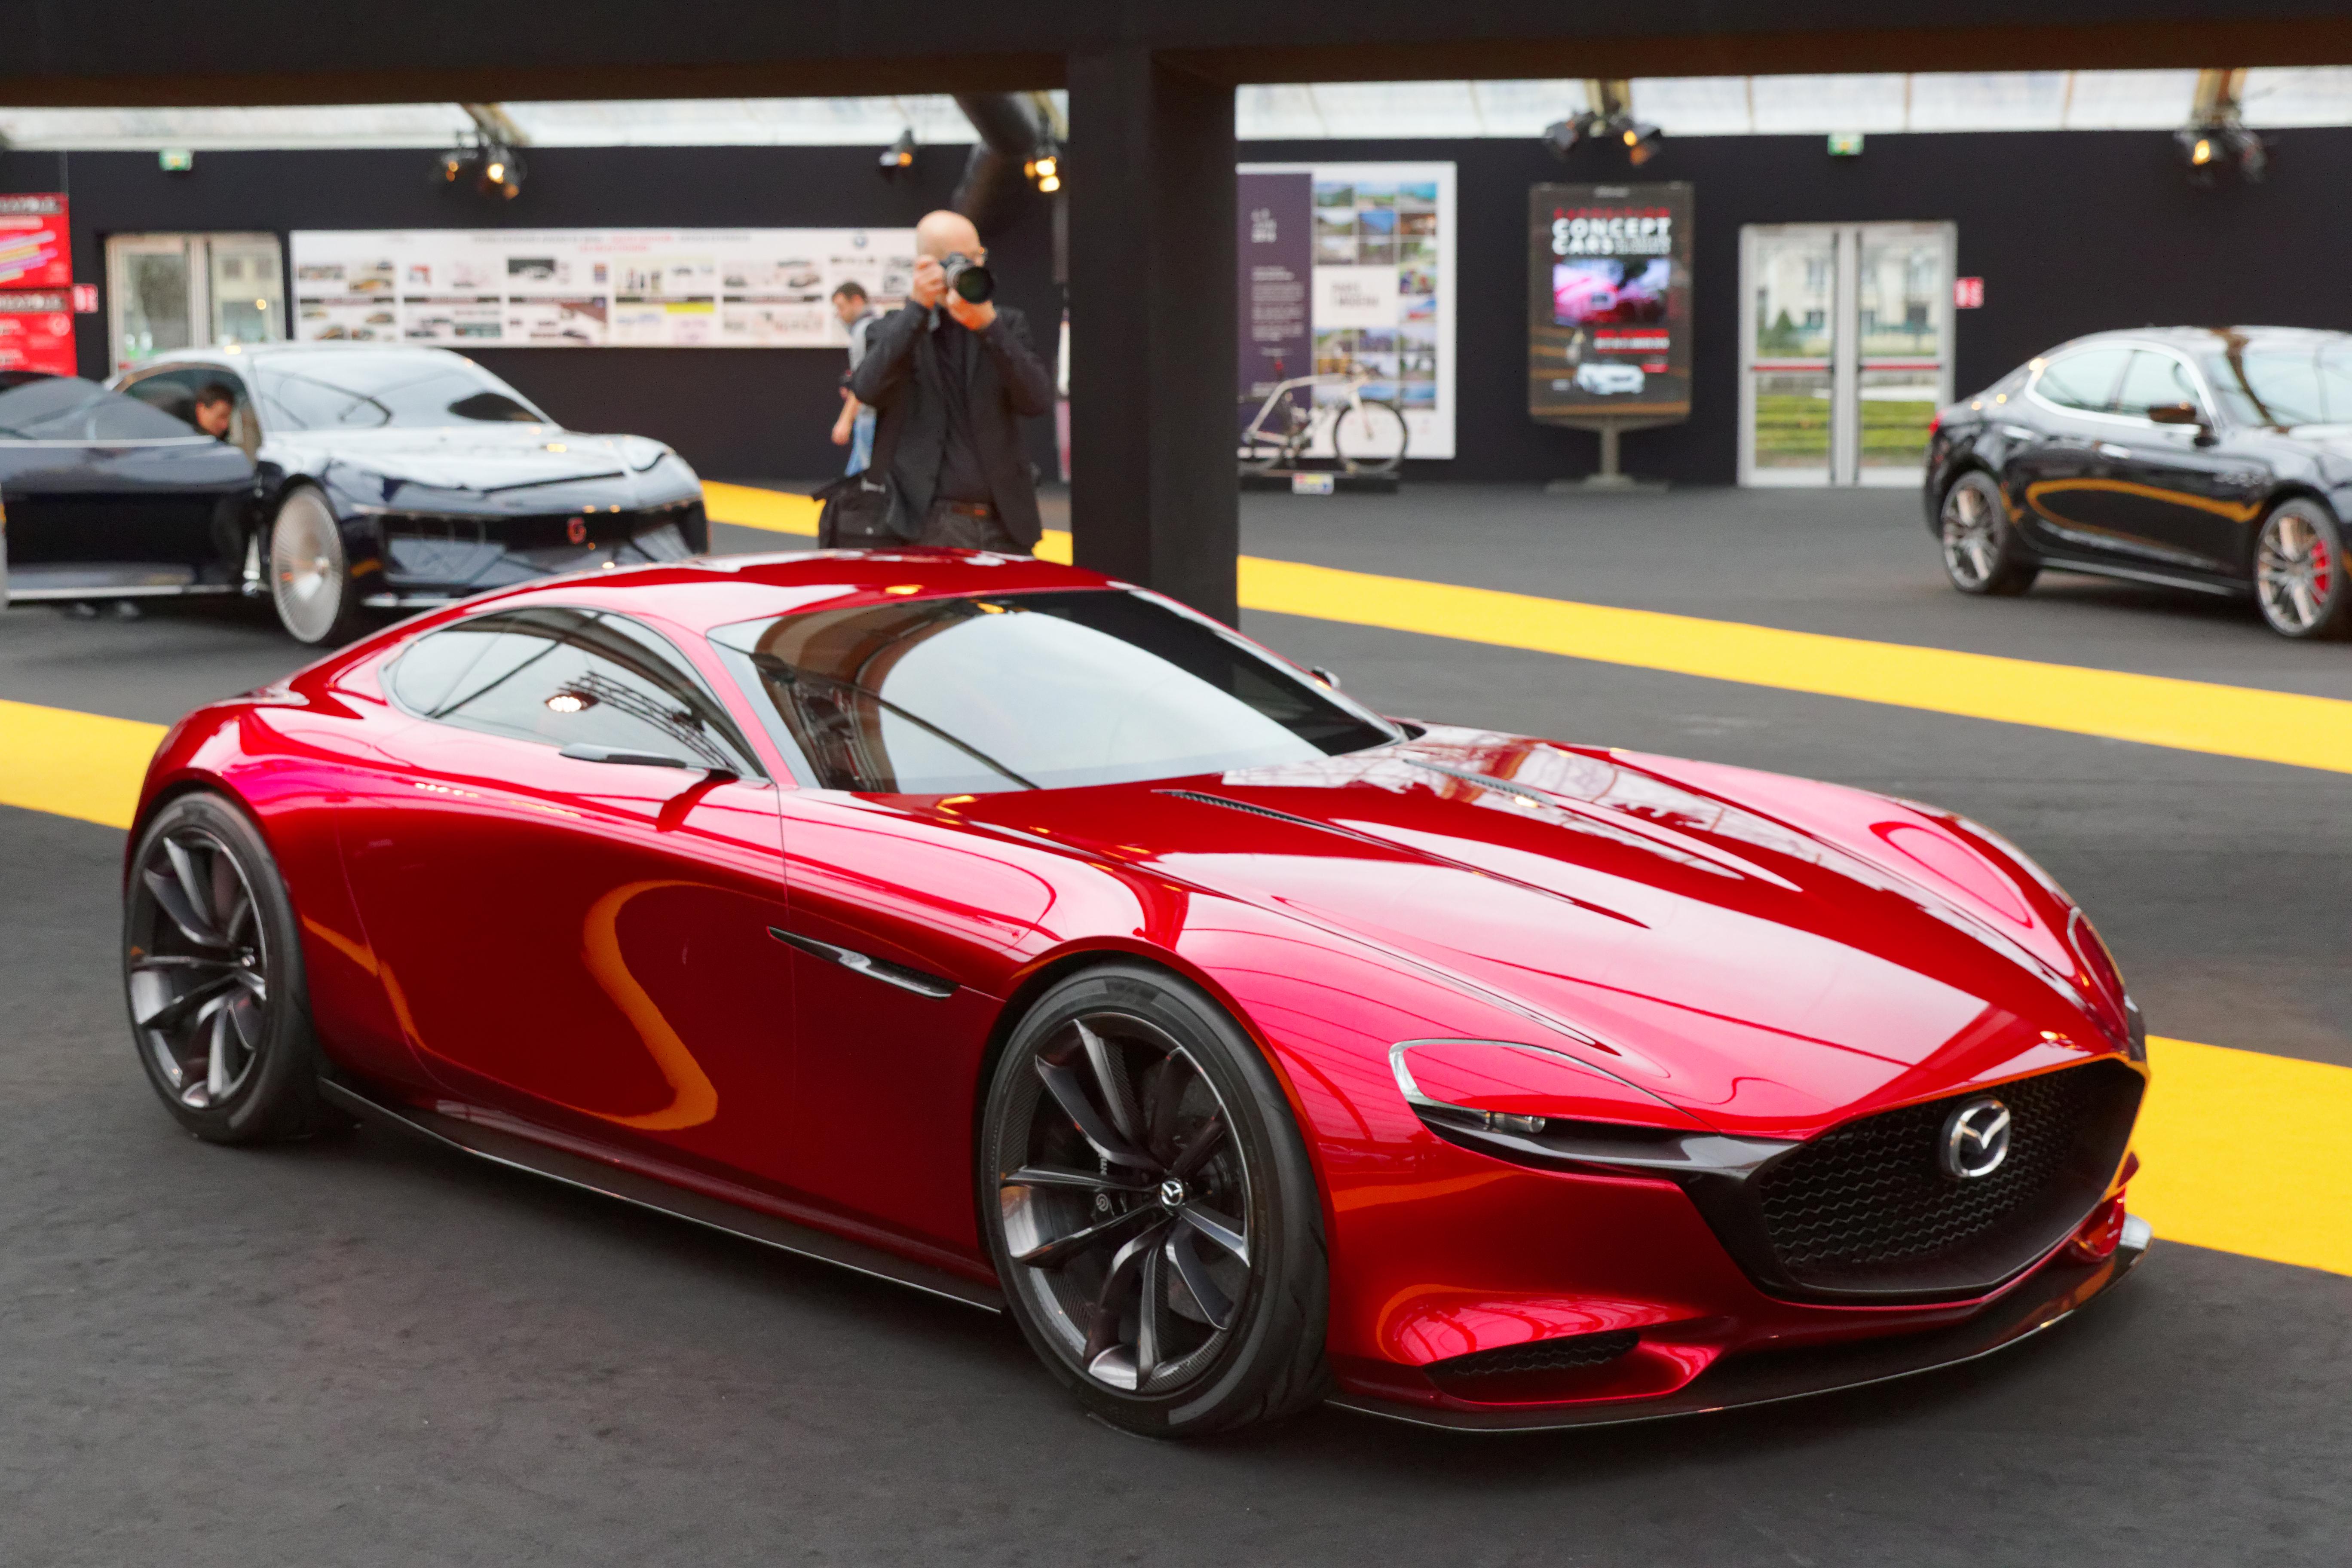 Kelebihan Kekurangan Mazda Rx Vision Tangguh